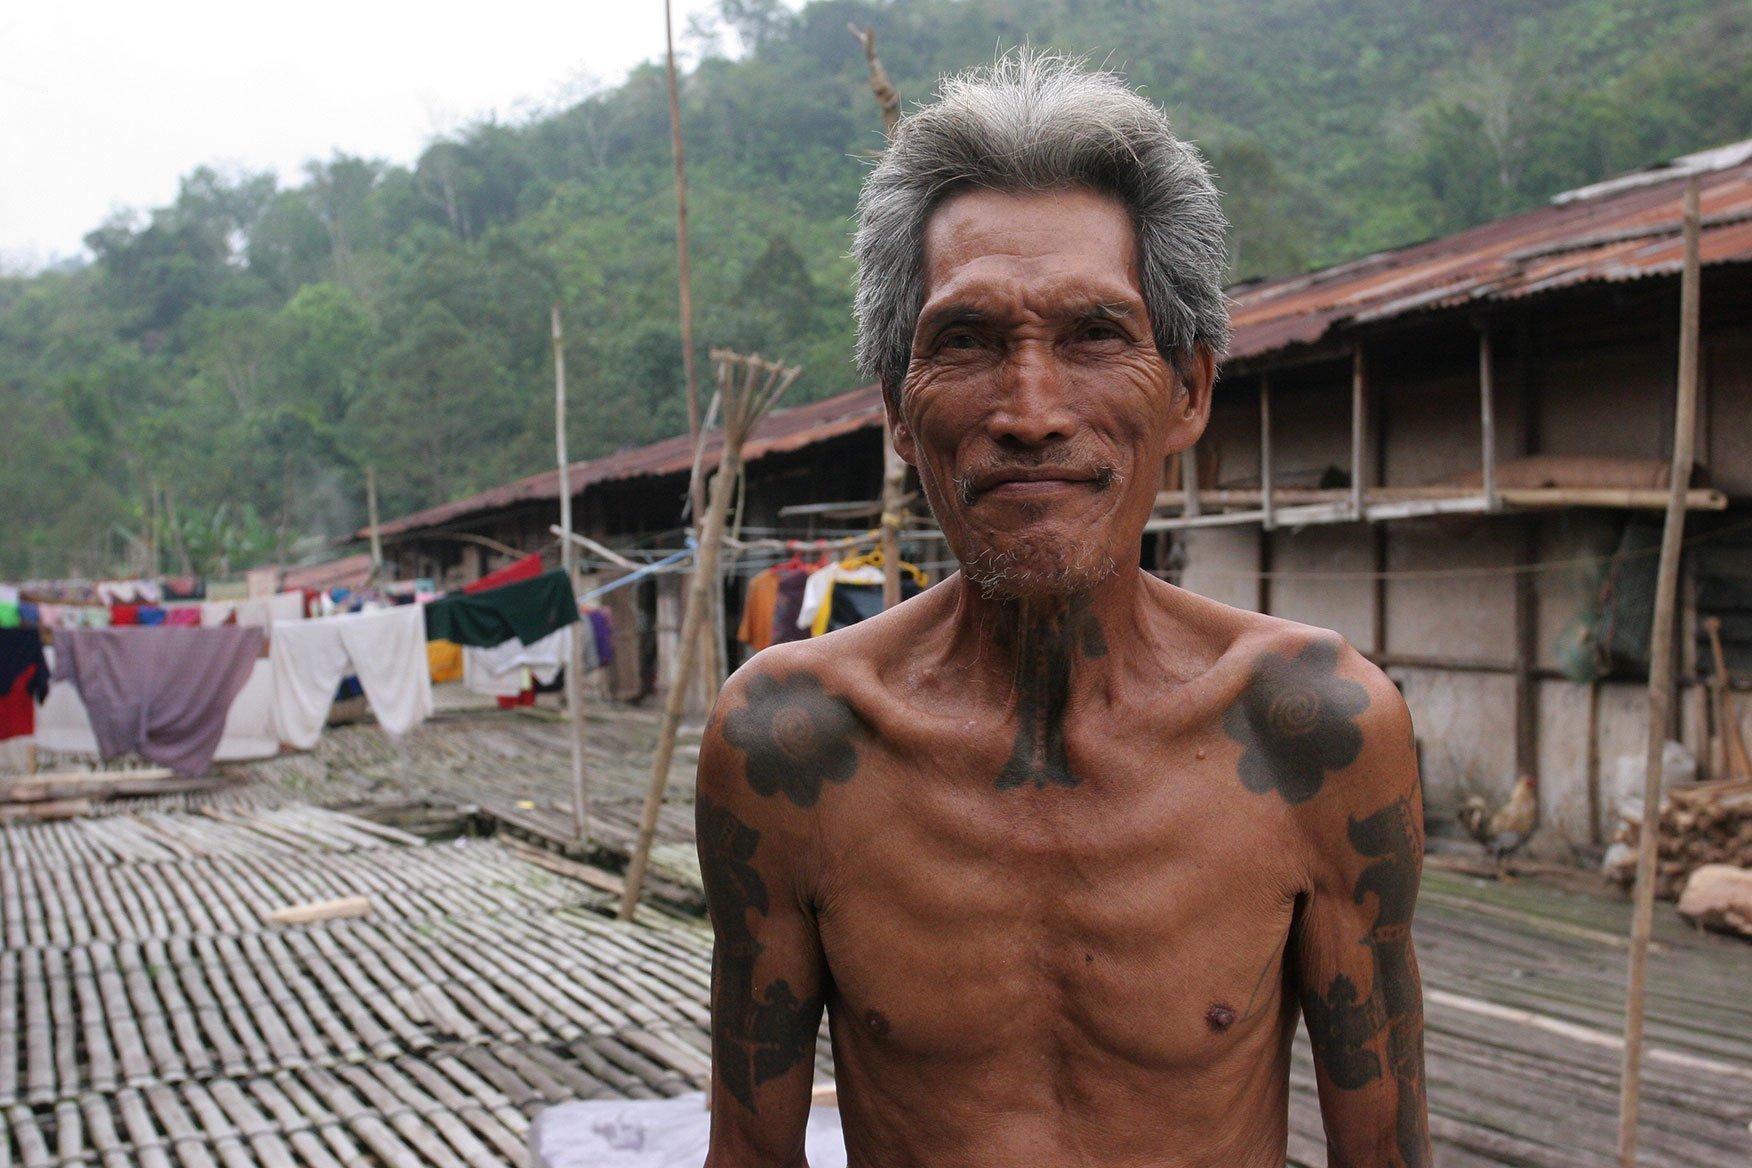 Local community near Kuching in Borneo